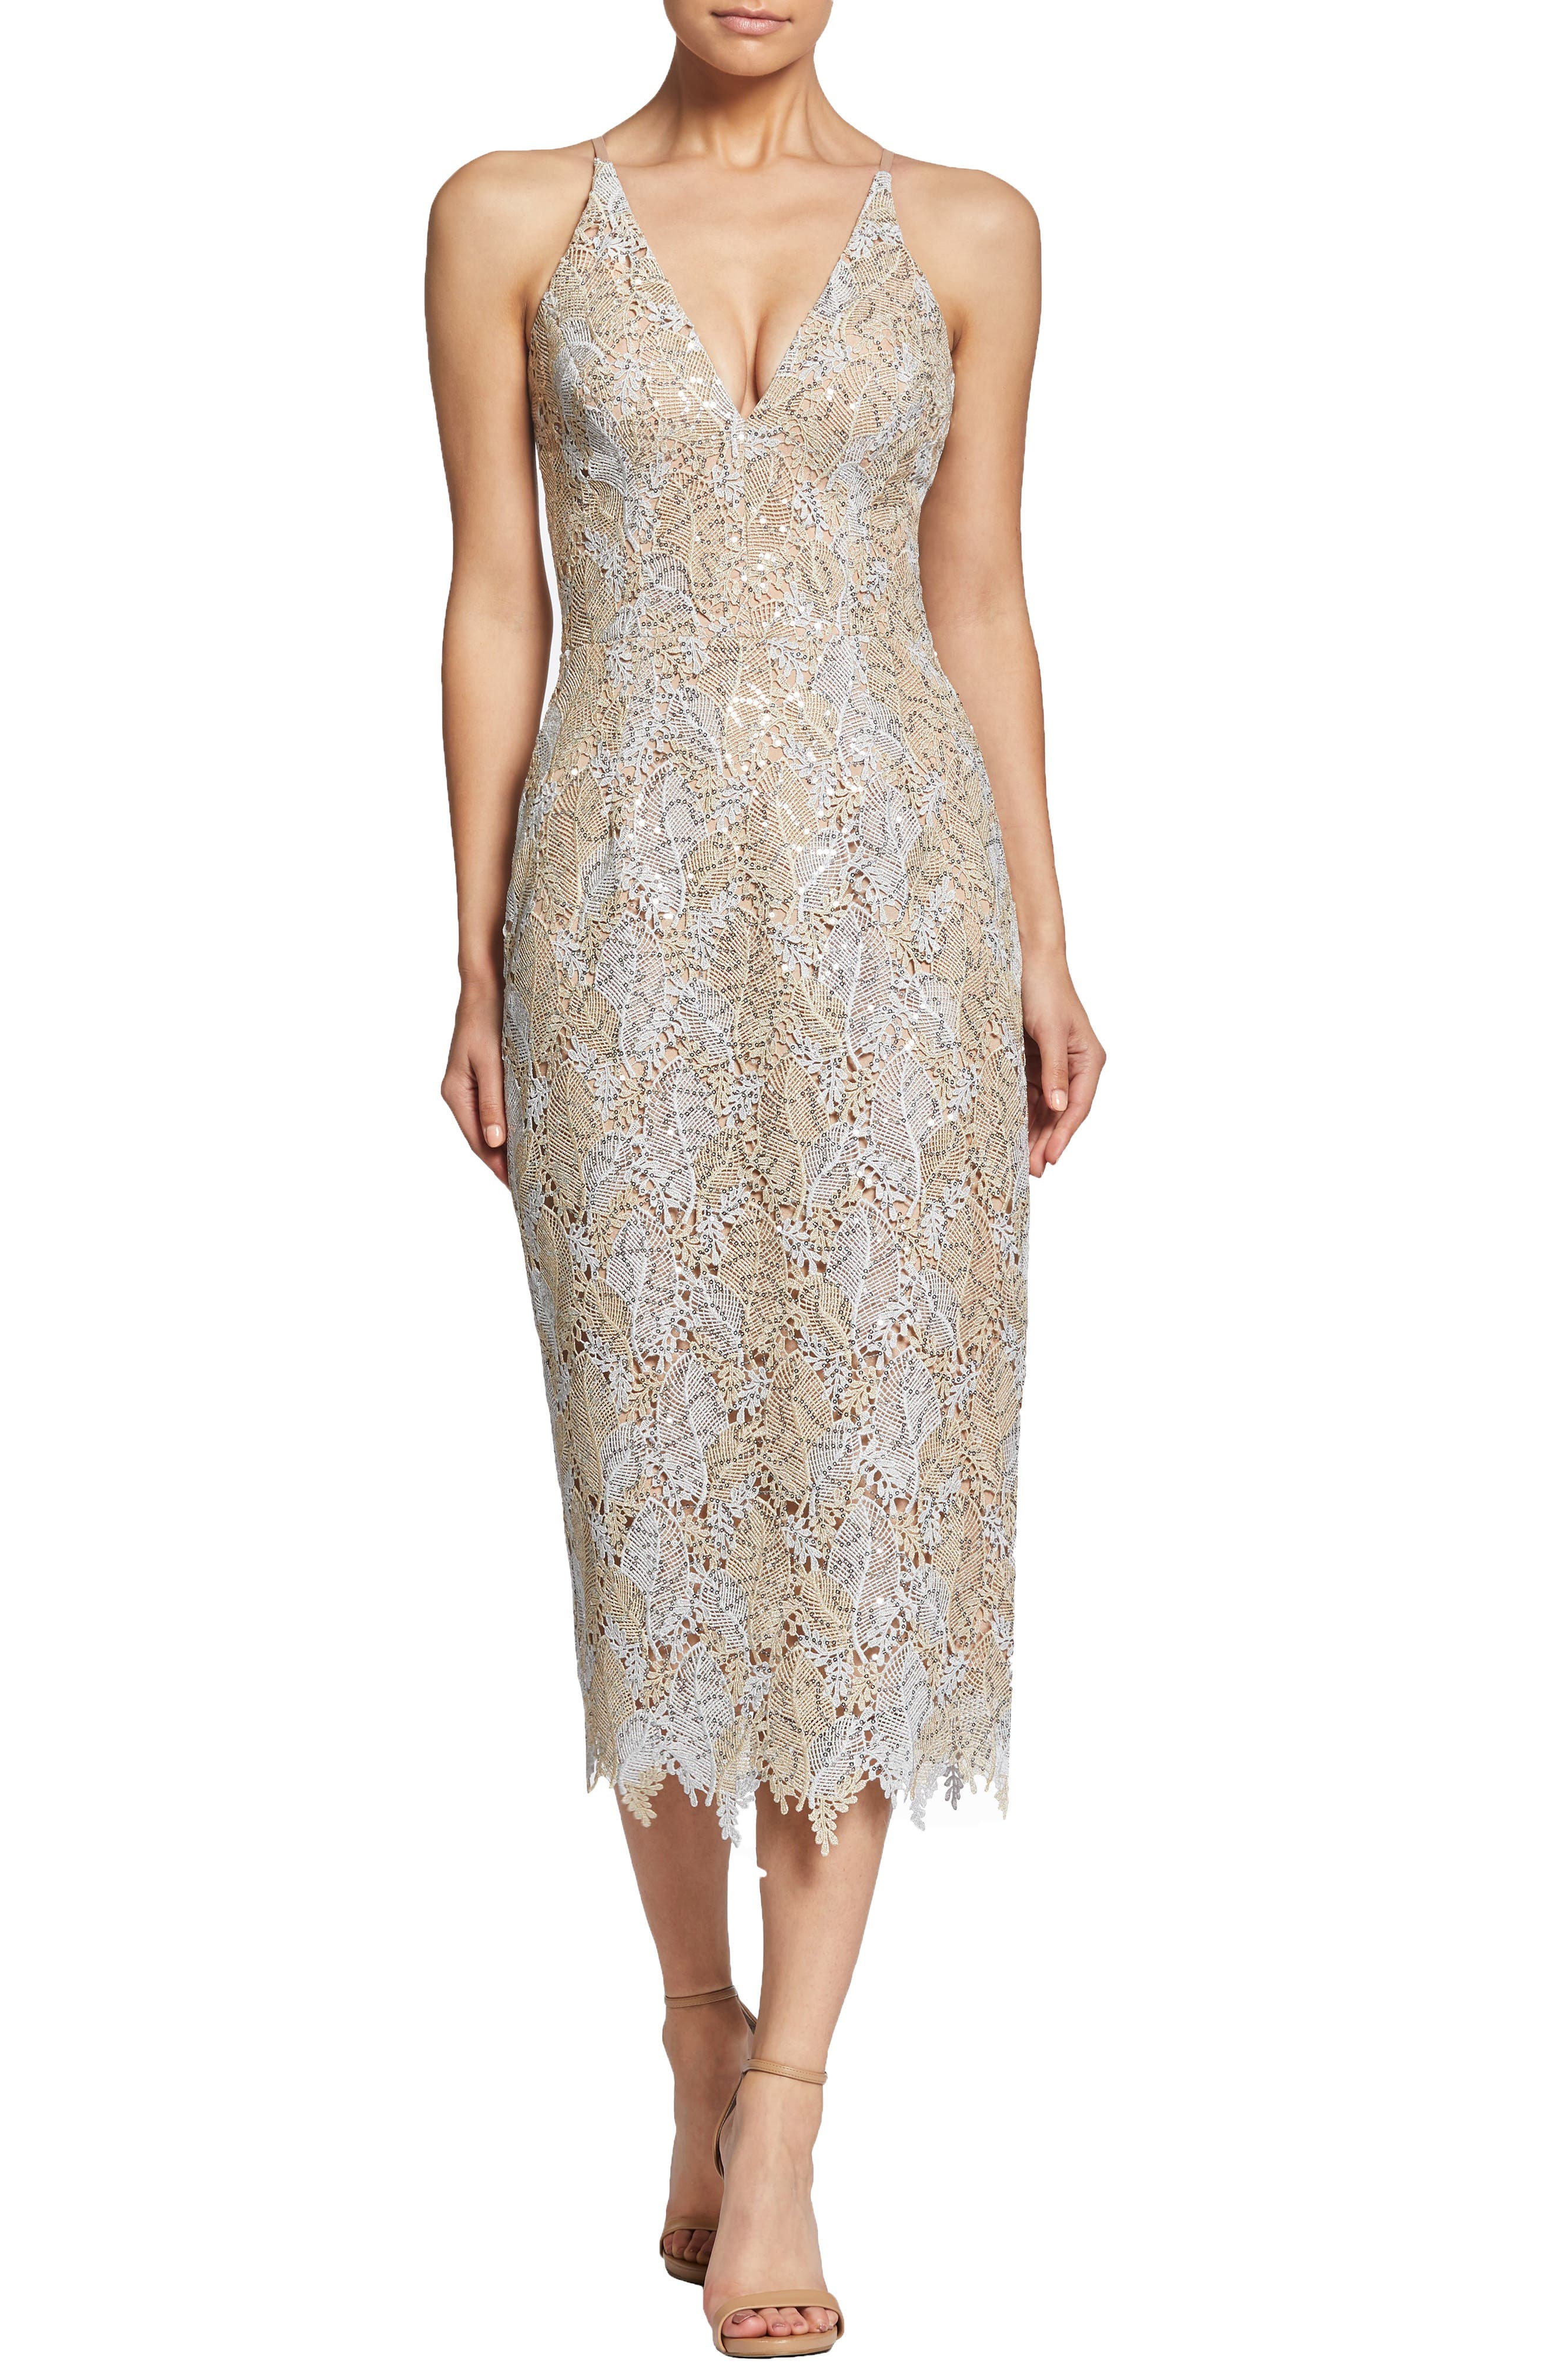 DRESS THE POPULATION Aurora Lace Sheath Dress, Main, color, PLATINUM/ GOLD